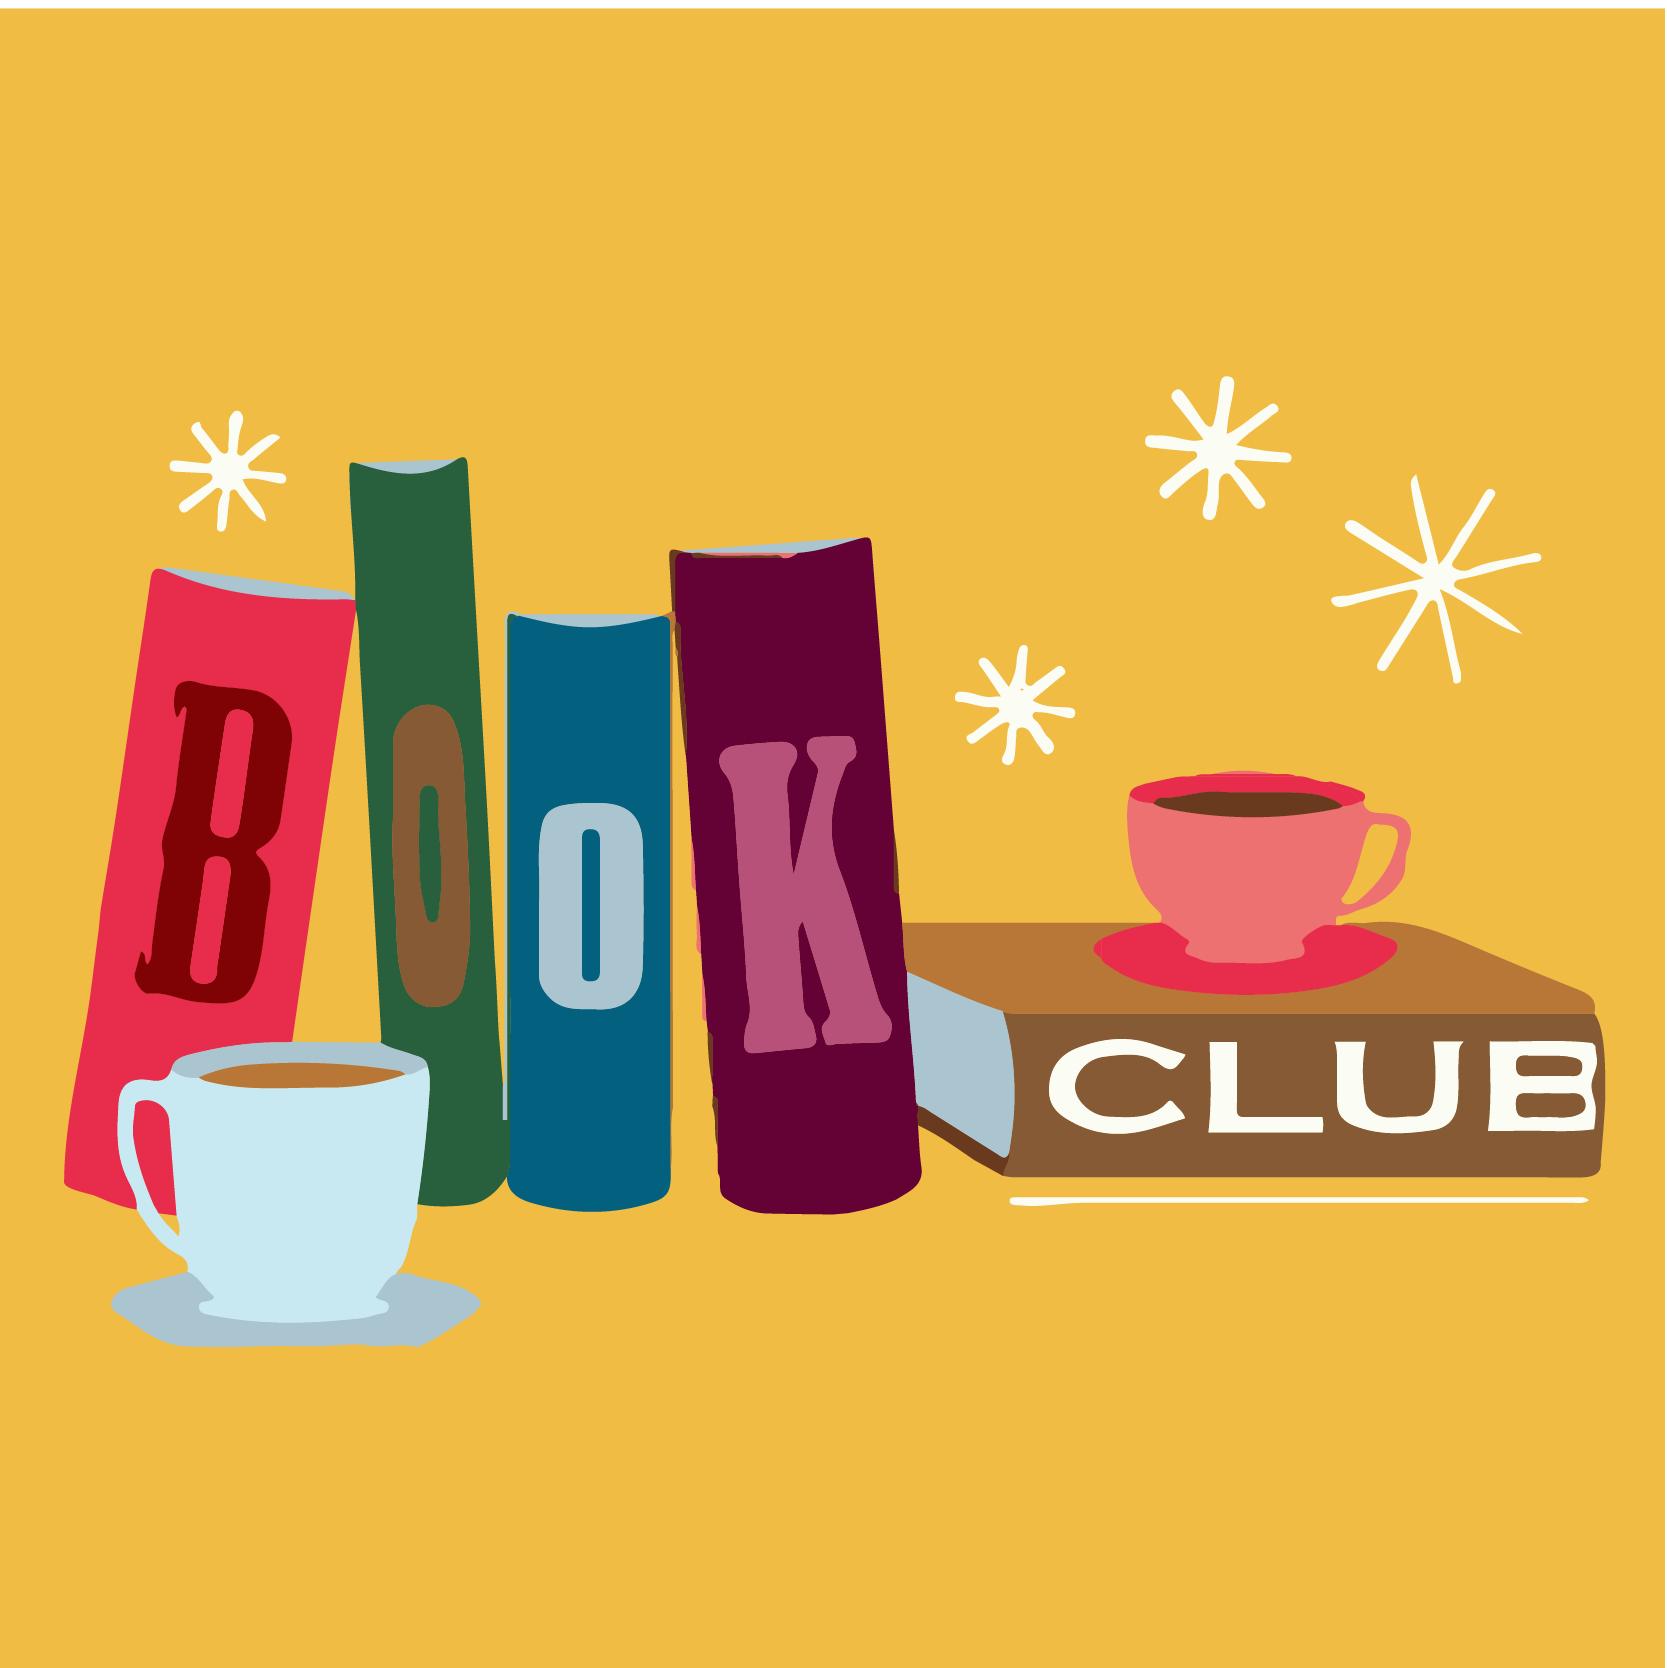 Book Club_Website Square.png